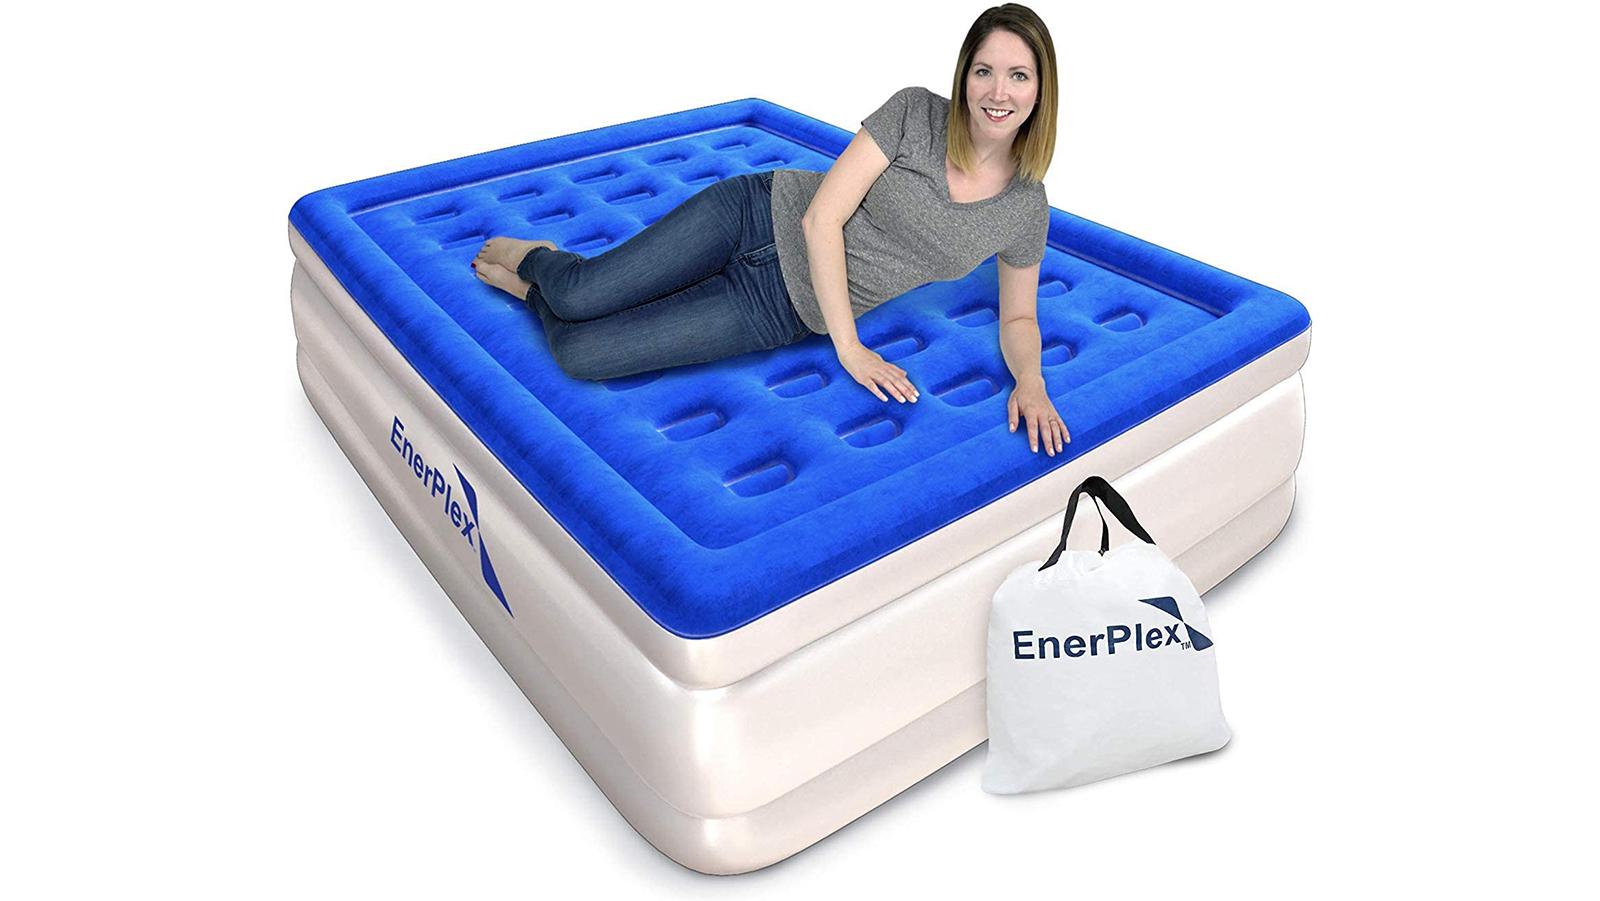 EnerPlex Dual Pump Luxury Air Mattress